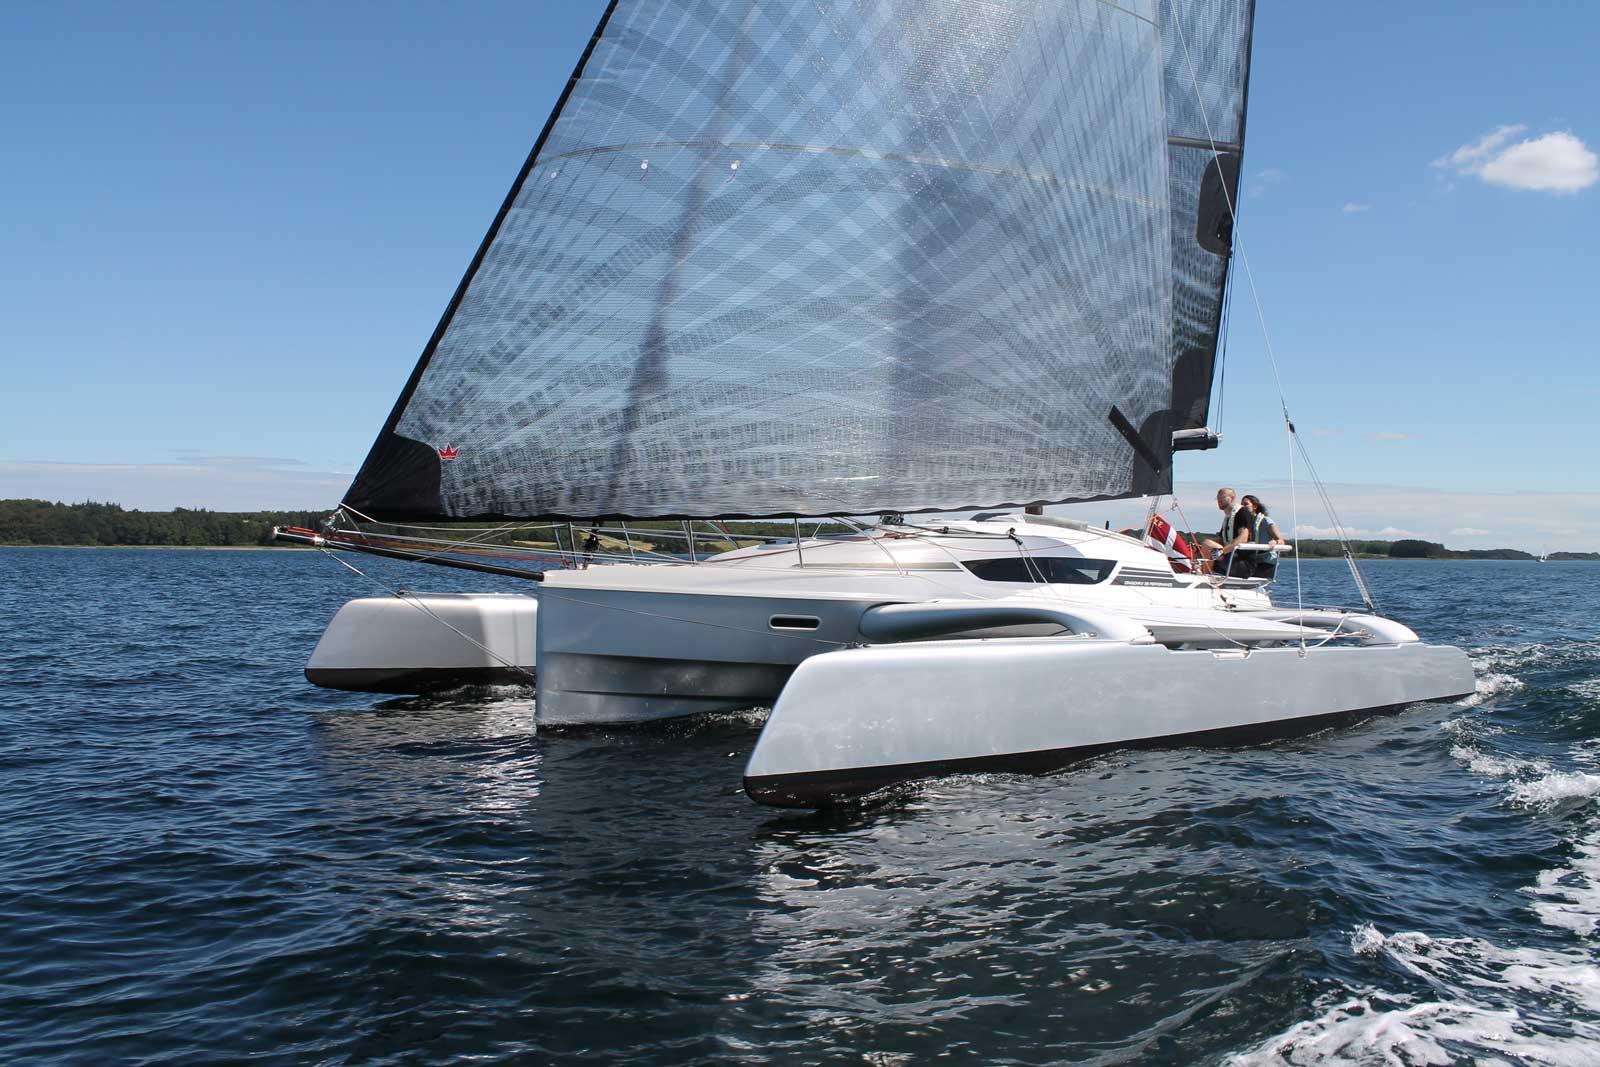 Sirena 58 Coupe, Eyachts Australia and New Zealand